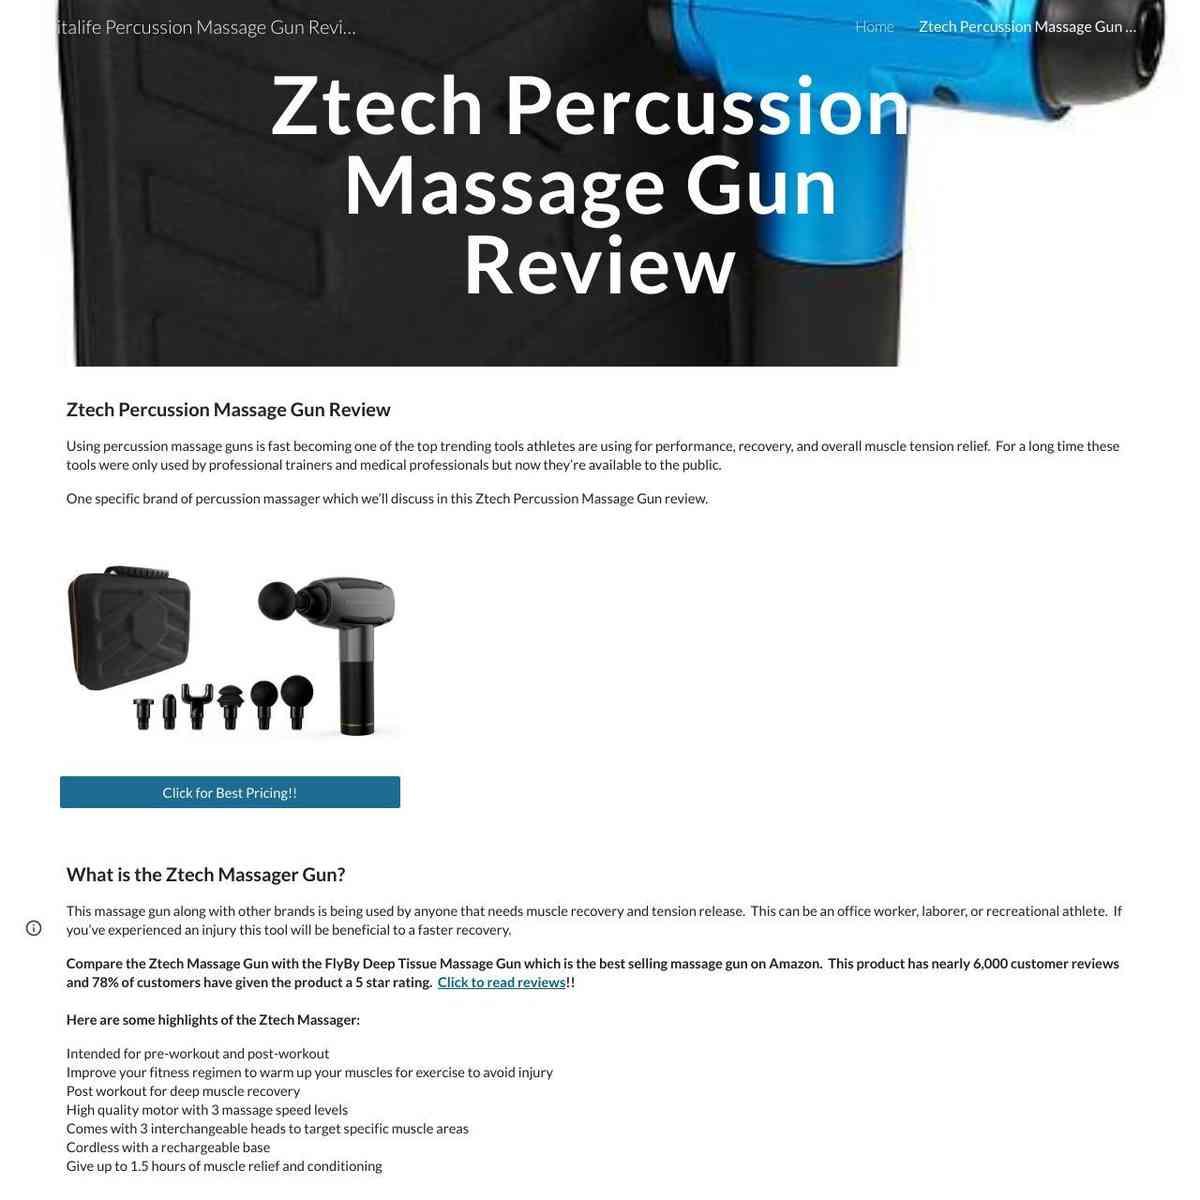 Ztech Percussion Massage Gun Review